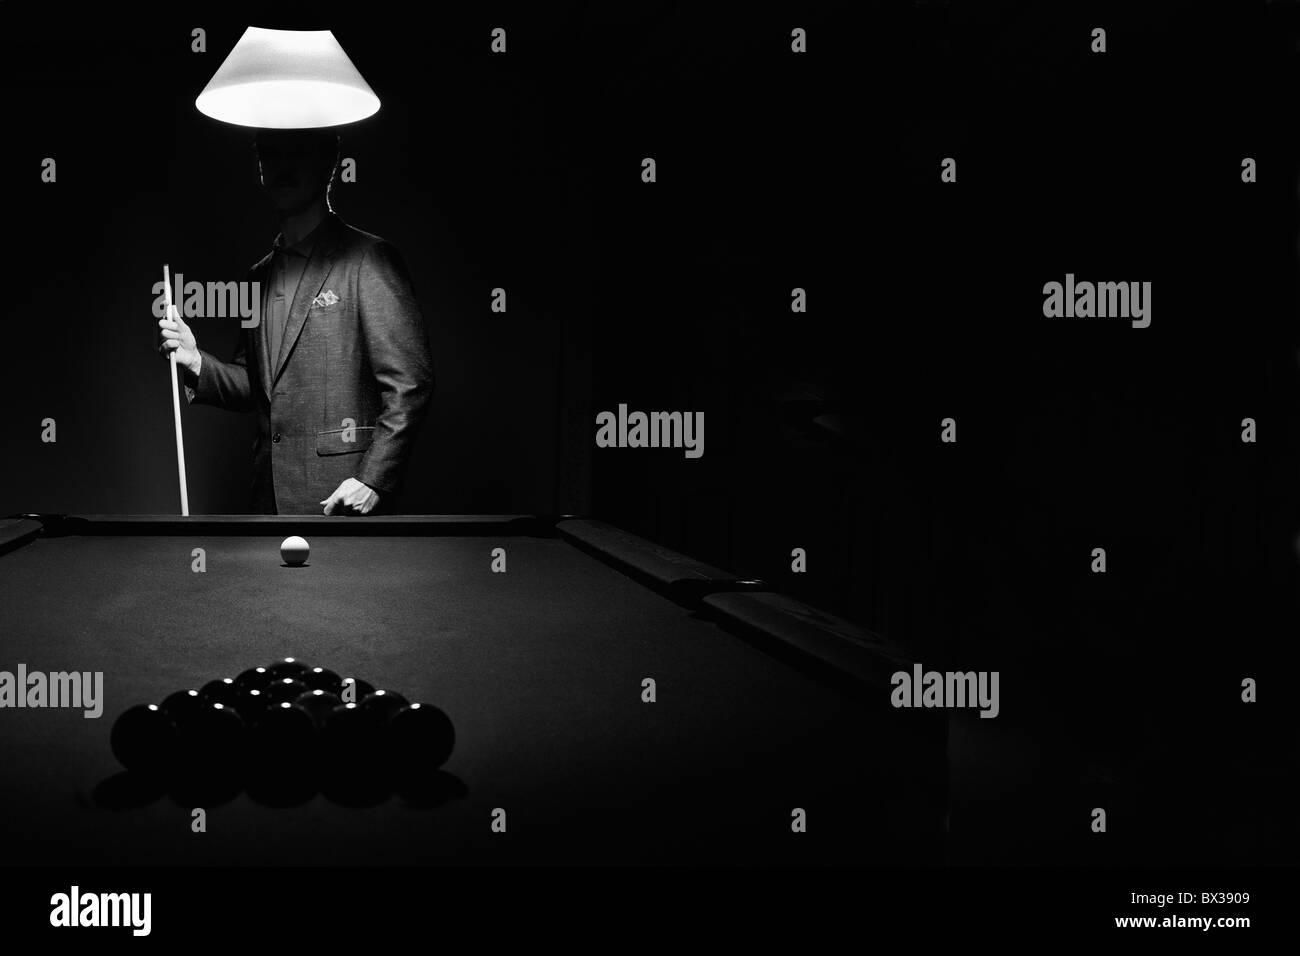 Mystery Pool Player Behind Rack Of Billiard Balls Stock Photo